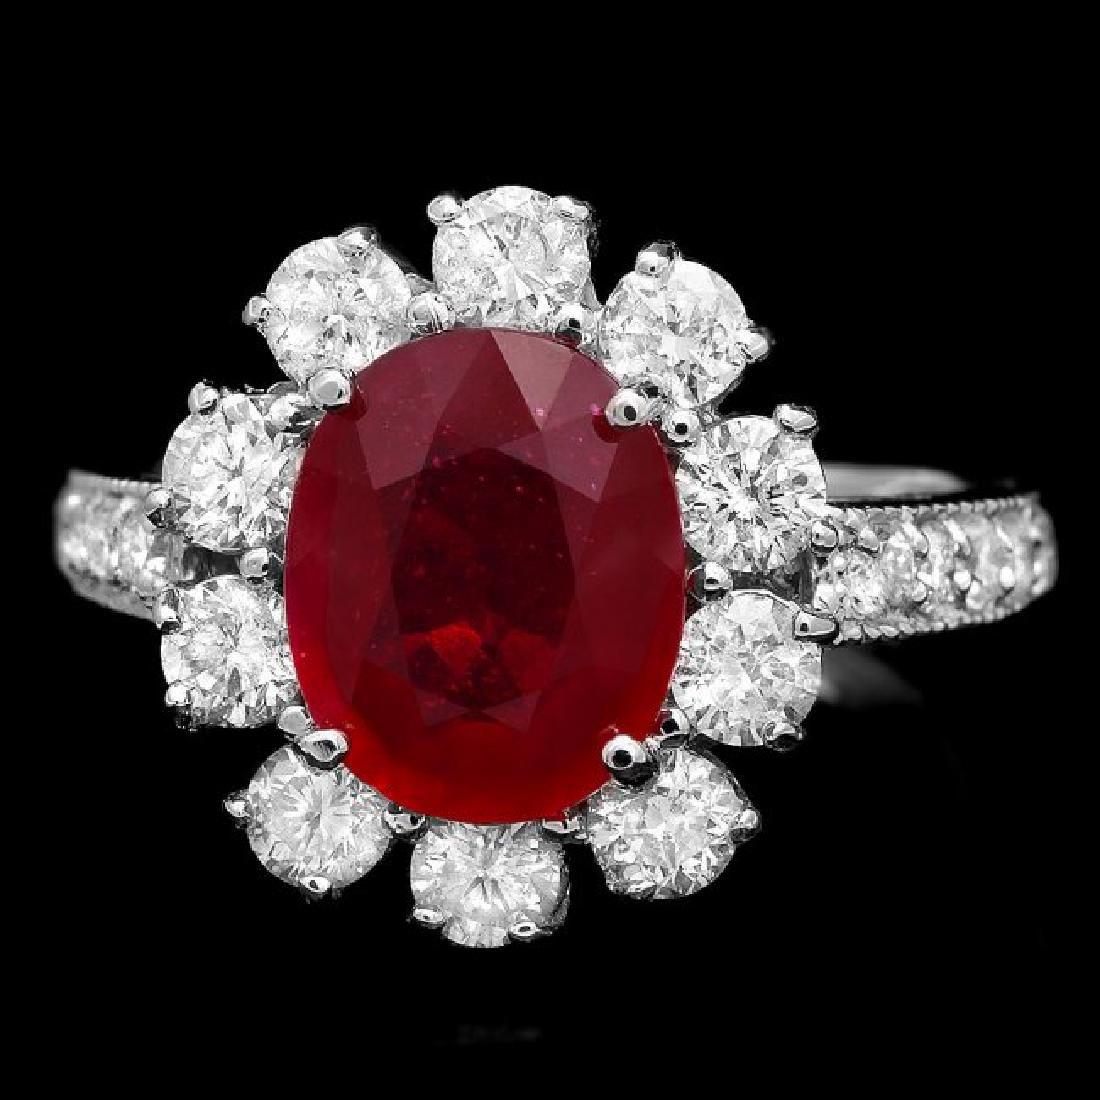 14k White Gold 3.20ct Ruby 1.50ct Diamond Ring - 2